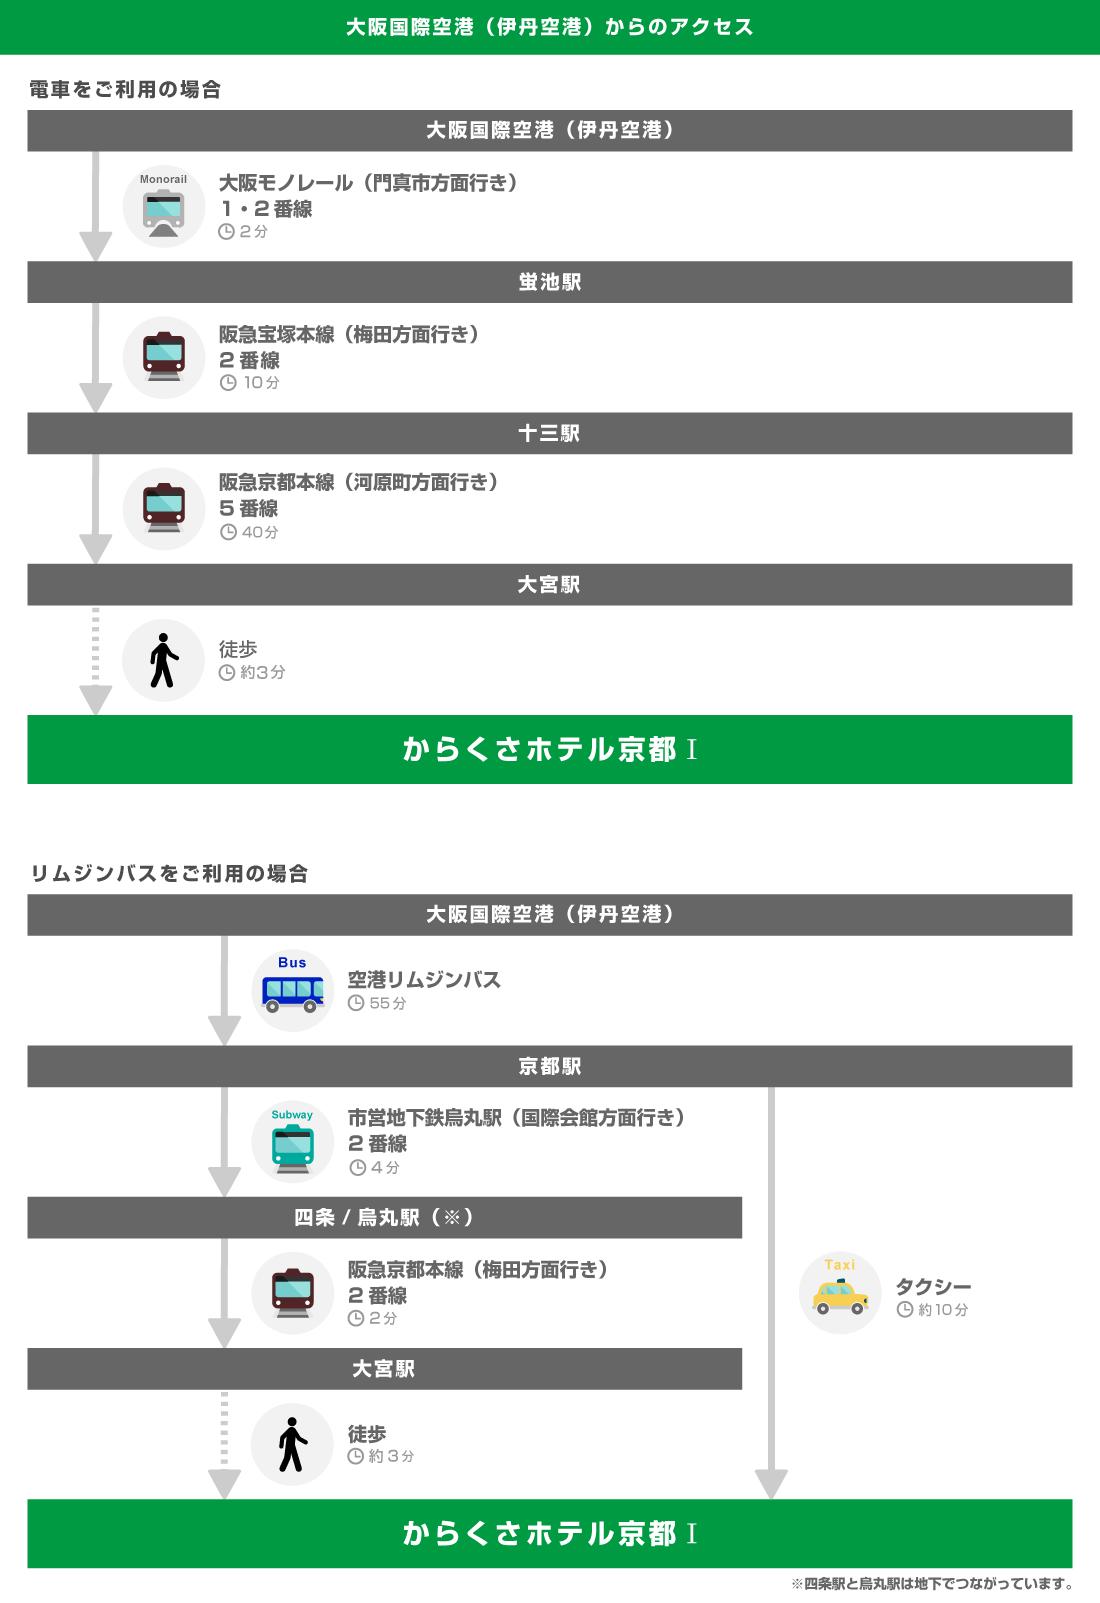 access_kyoto_pc_2_jp